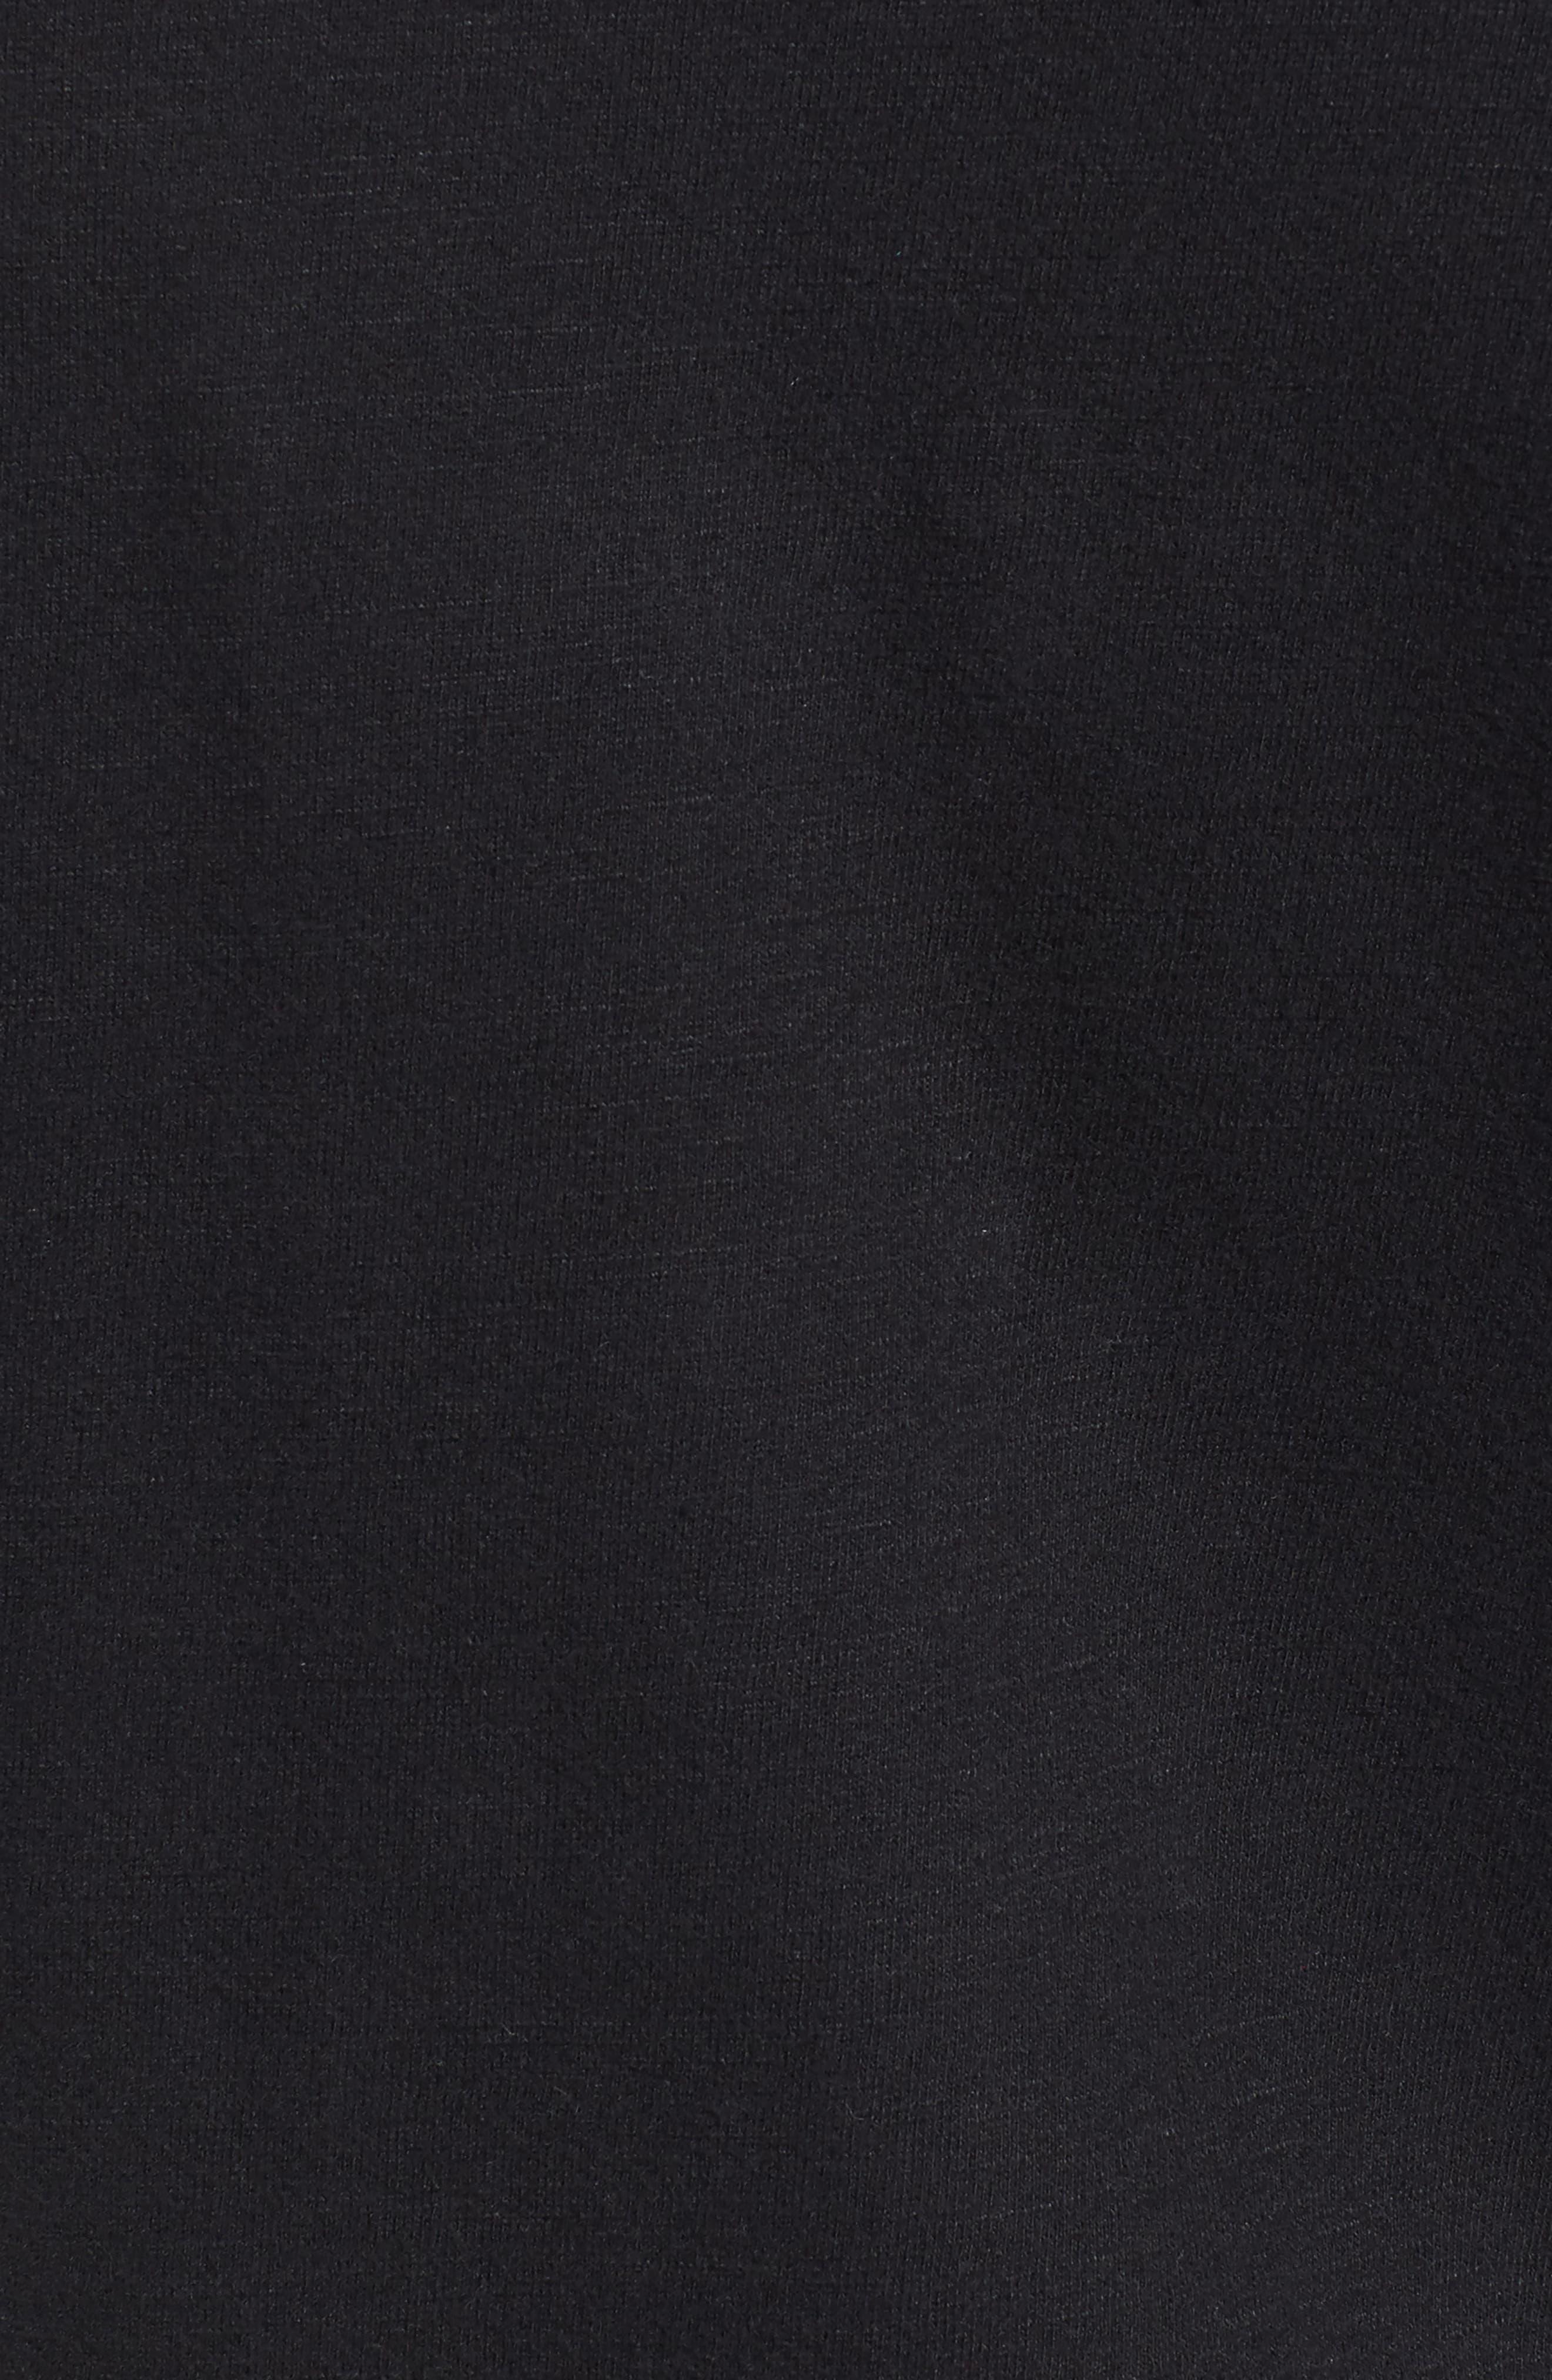 Distressed Print Slim Fit Crewneck T-Shirt,                             Alternate thumbnail 5, color,                             001